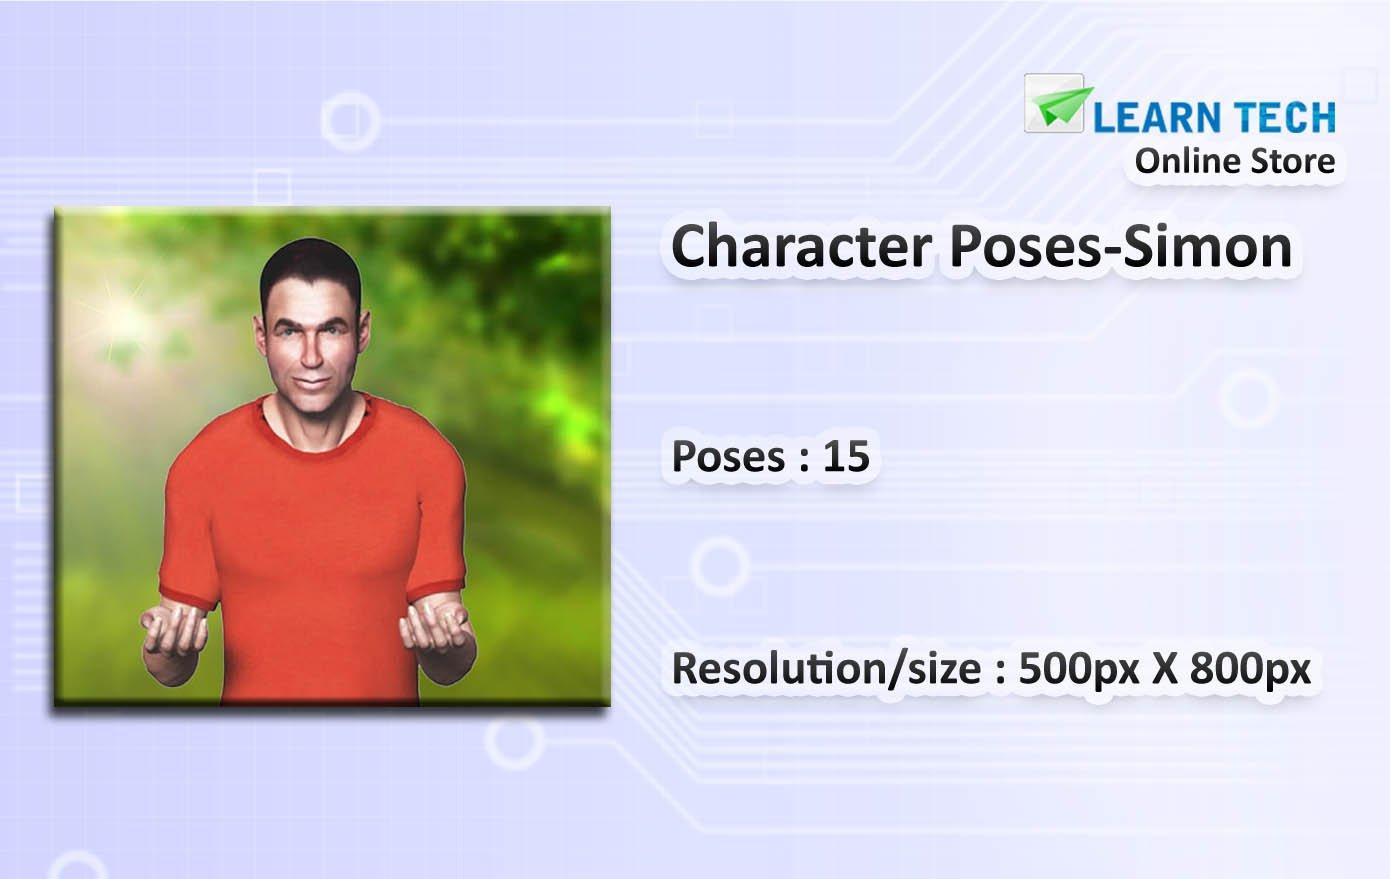 Character Poses - Simon - Character Poses for Training decks